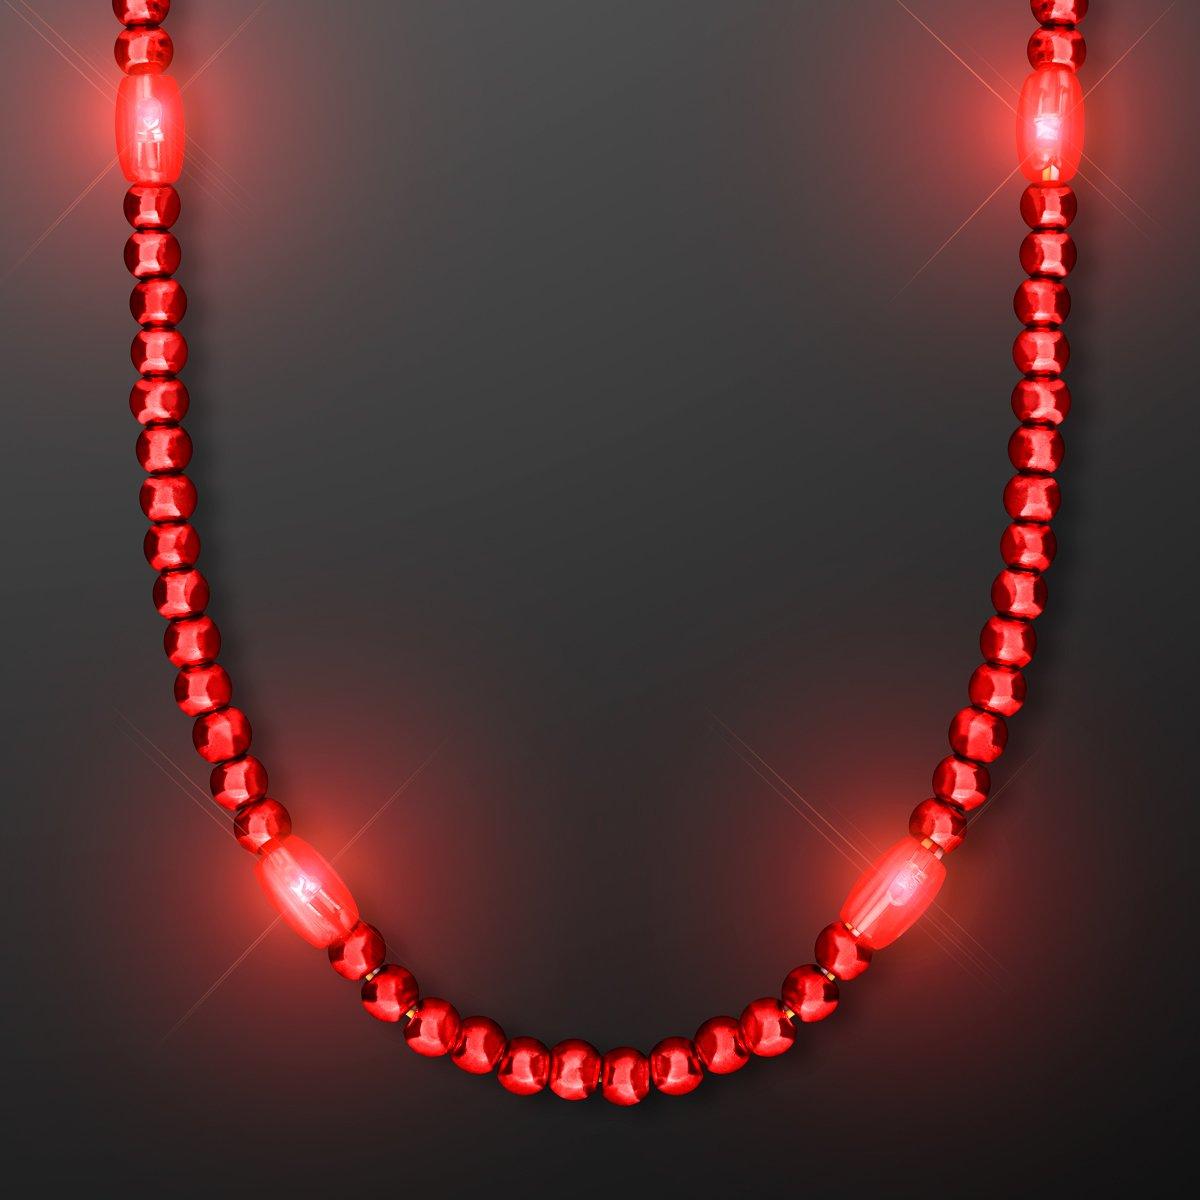 Rocking Red LED Light Up Mardi Gras Beads